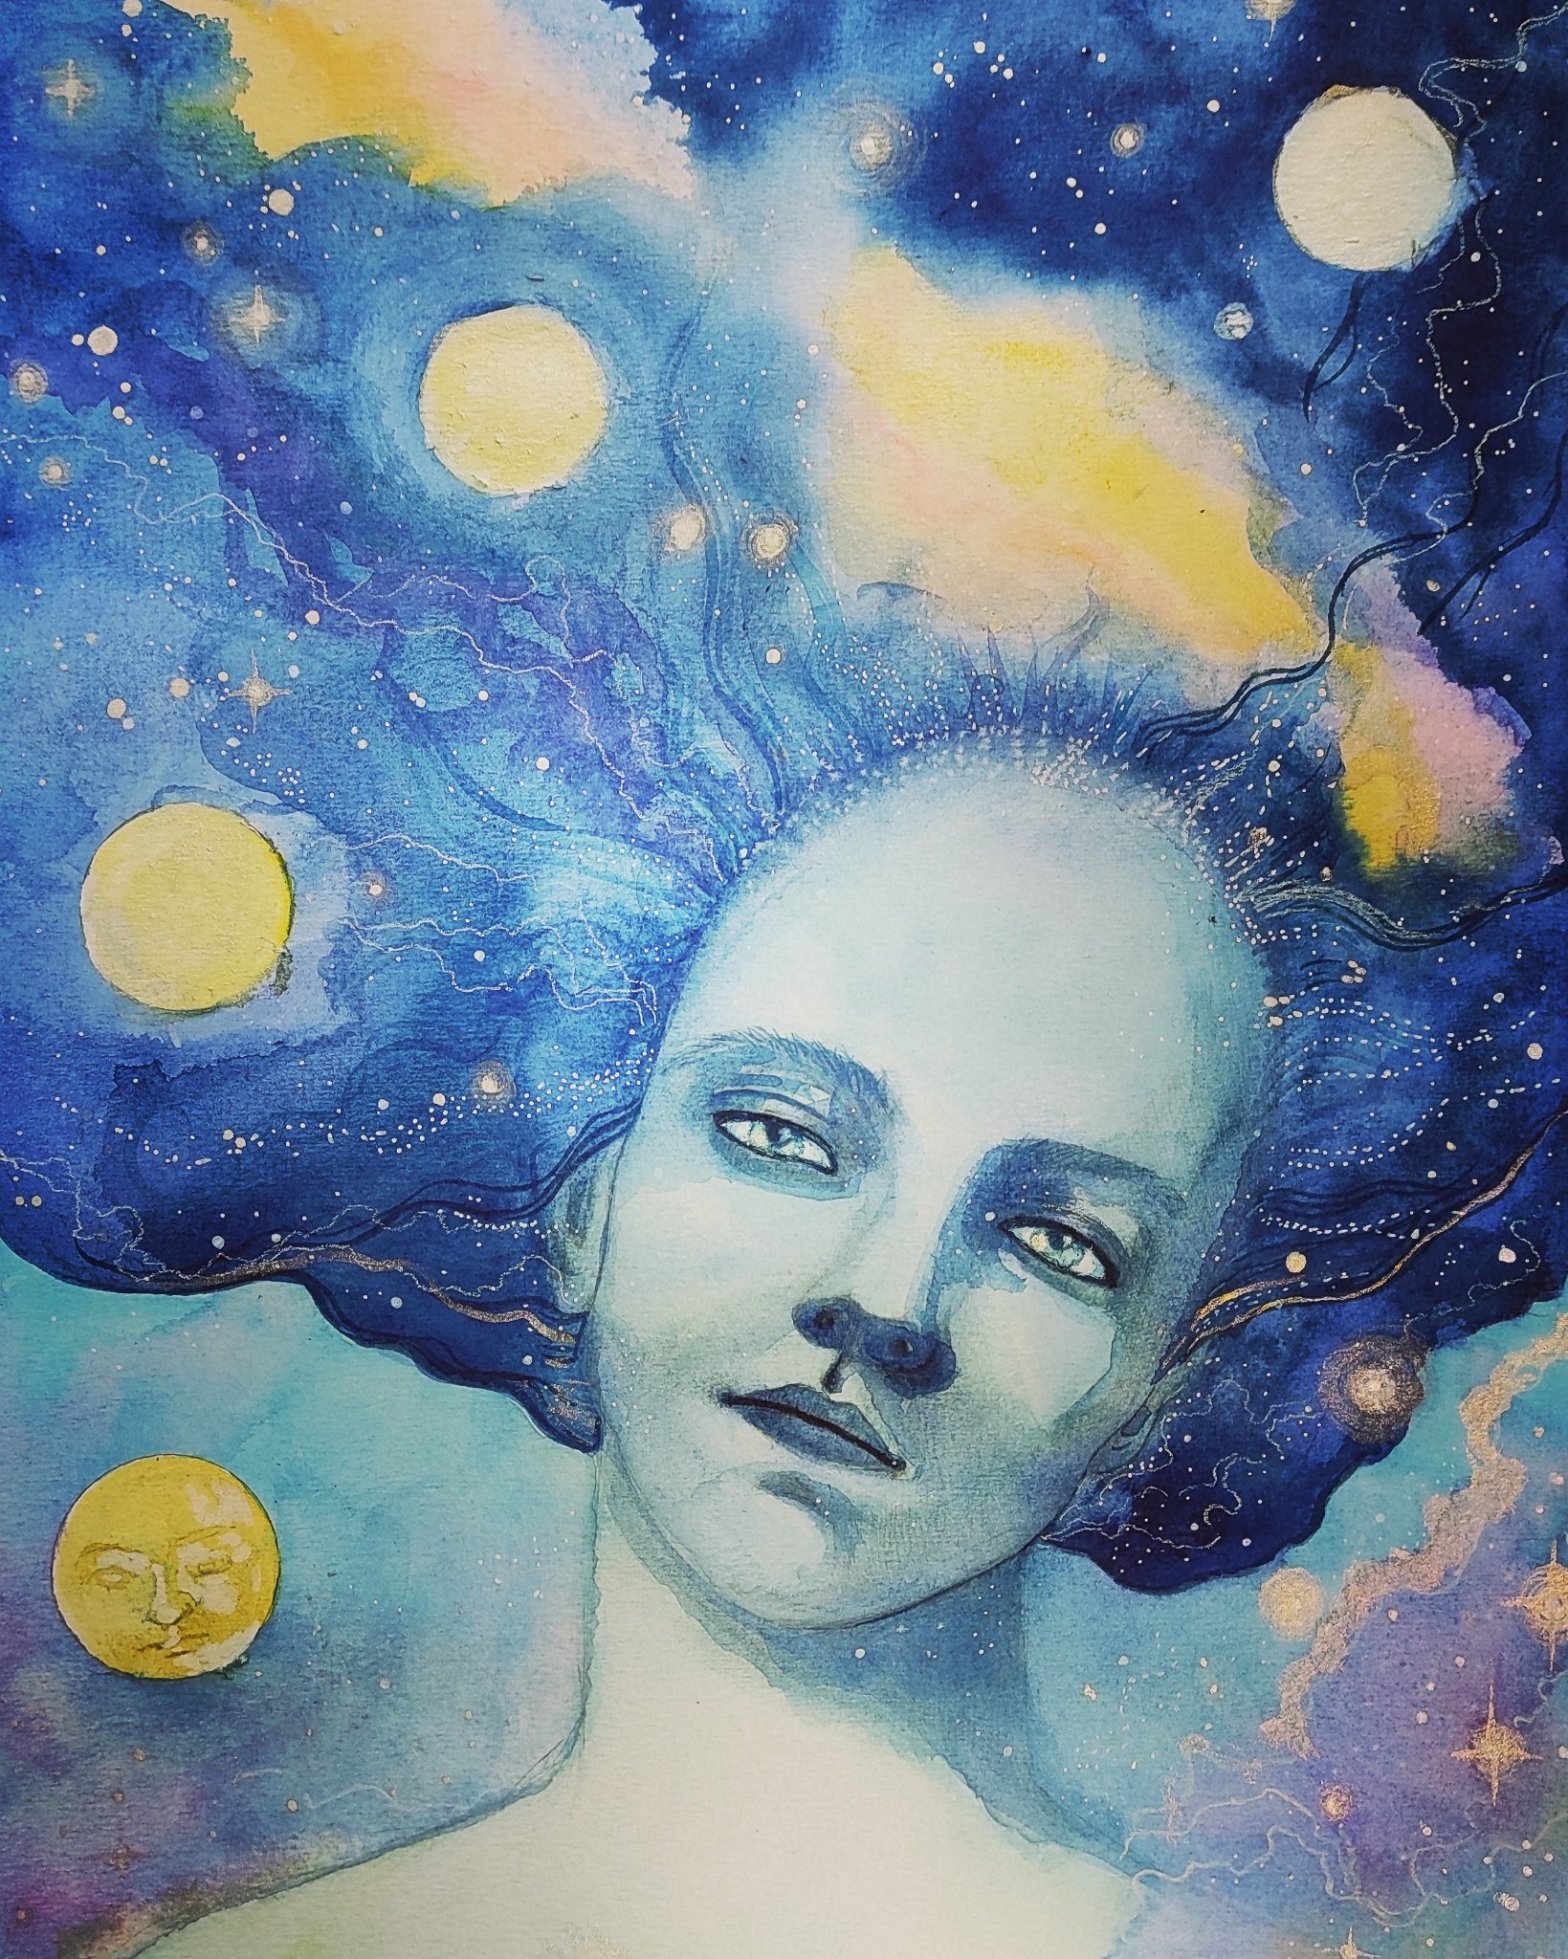 Dreamy art by Googie McCabe